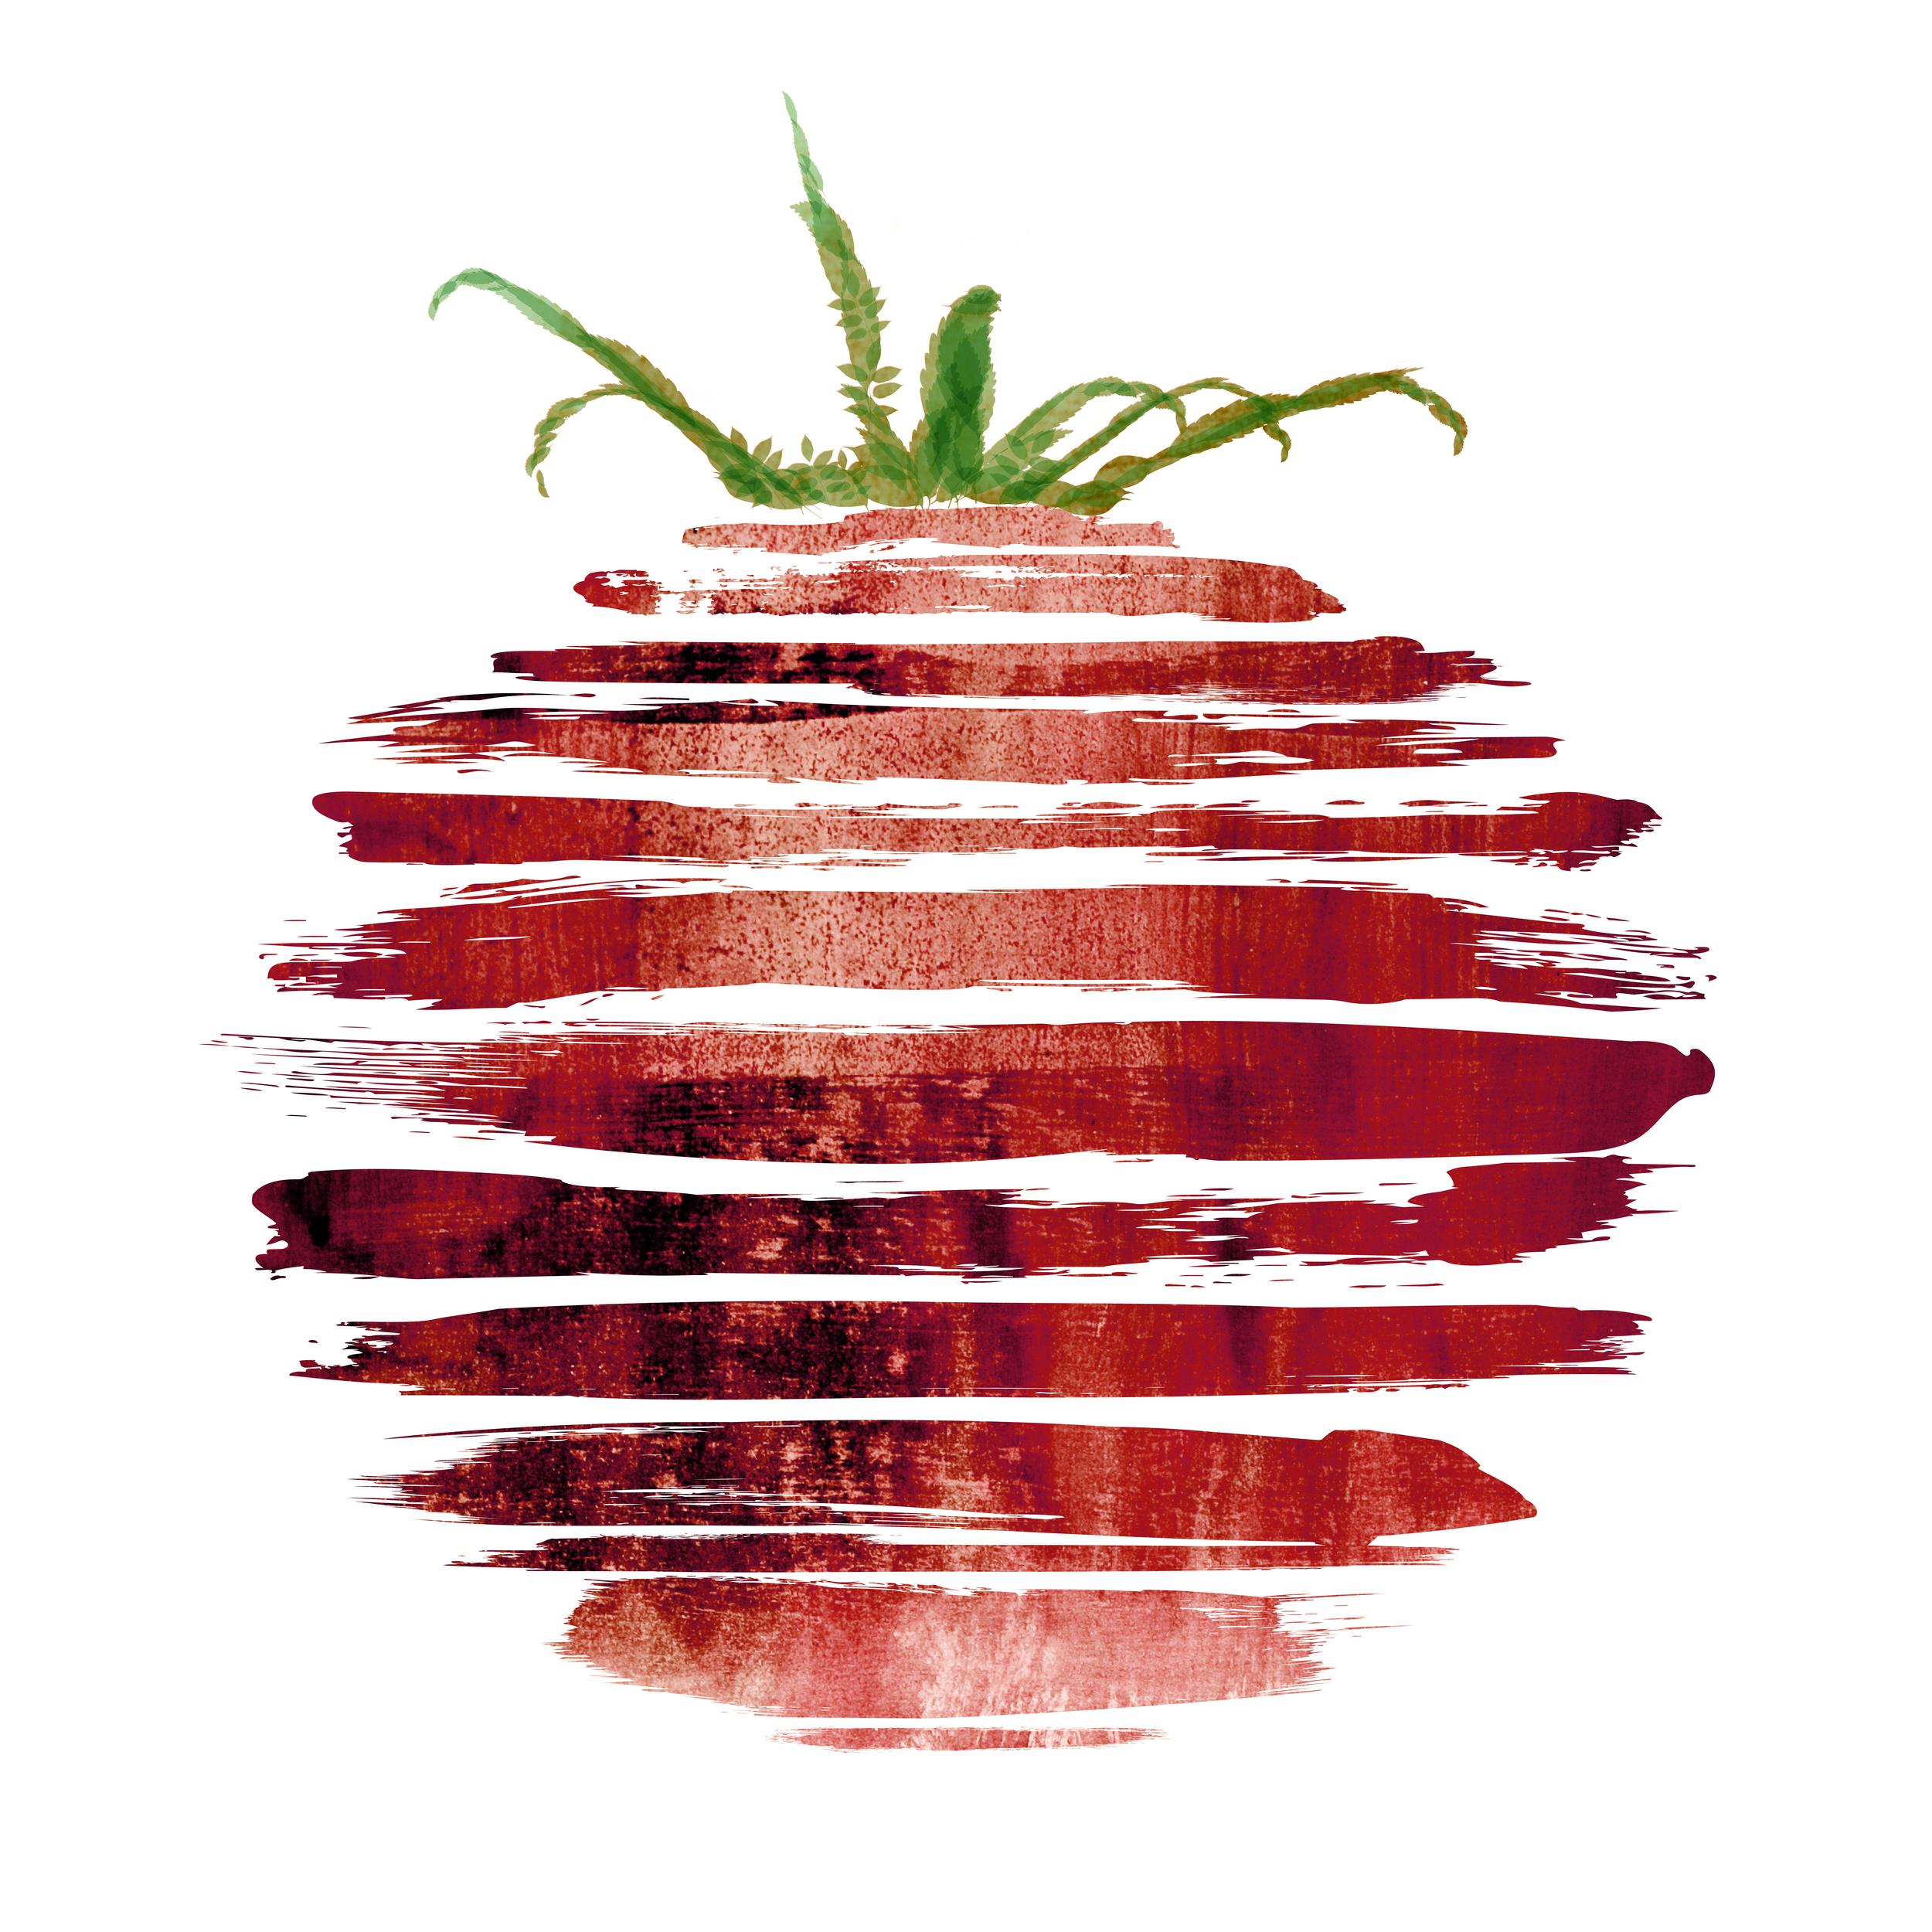 Tomato_24x24_300dpi.jpg